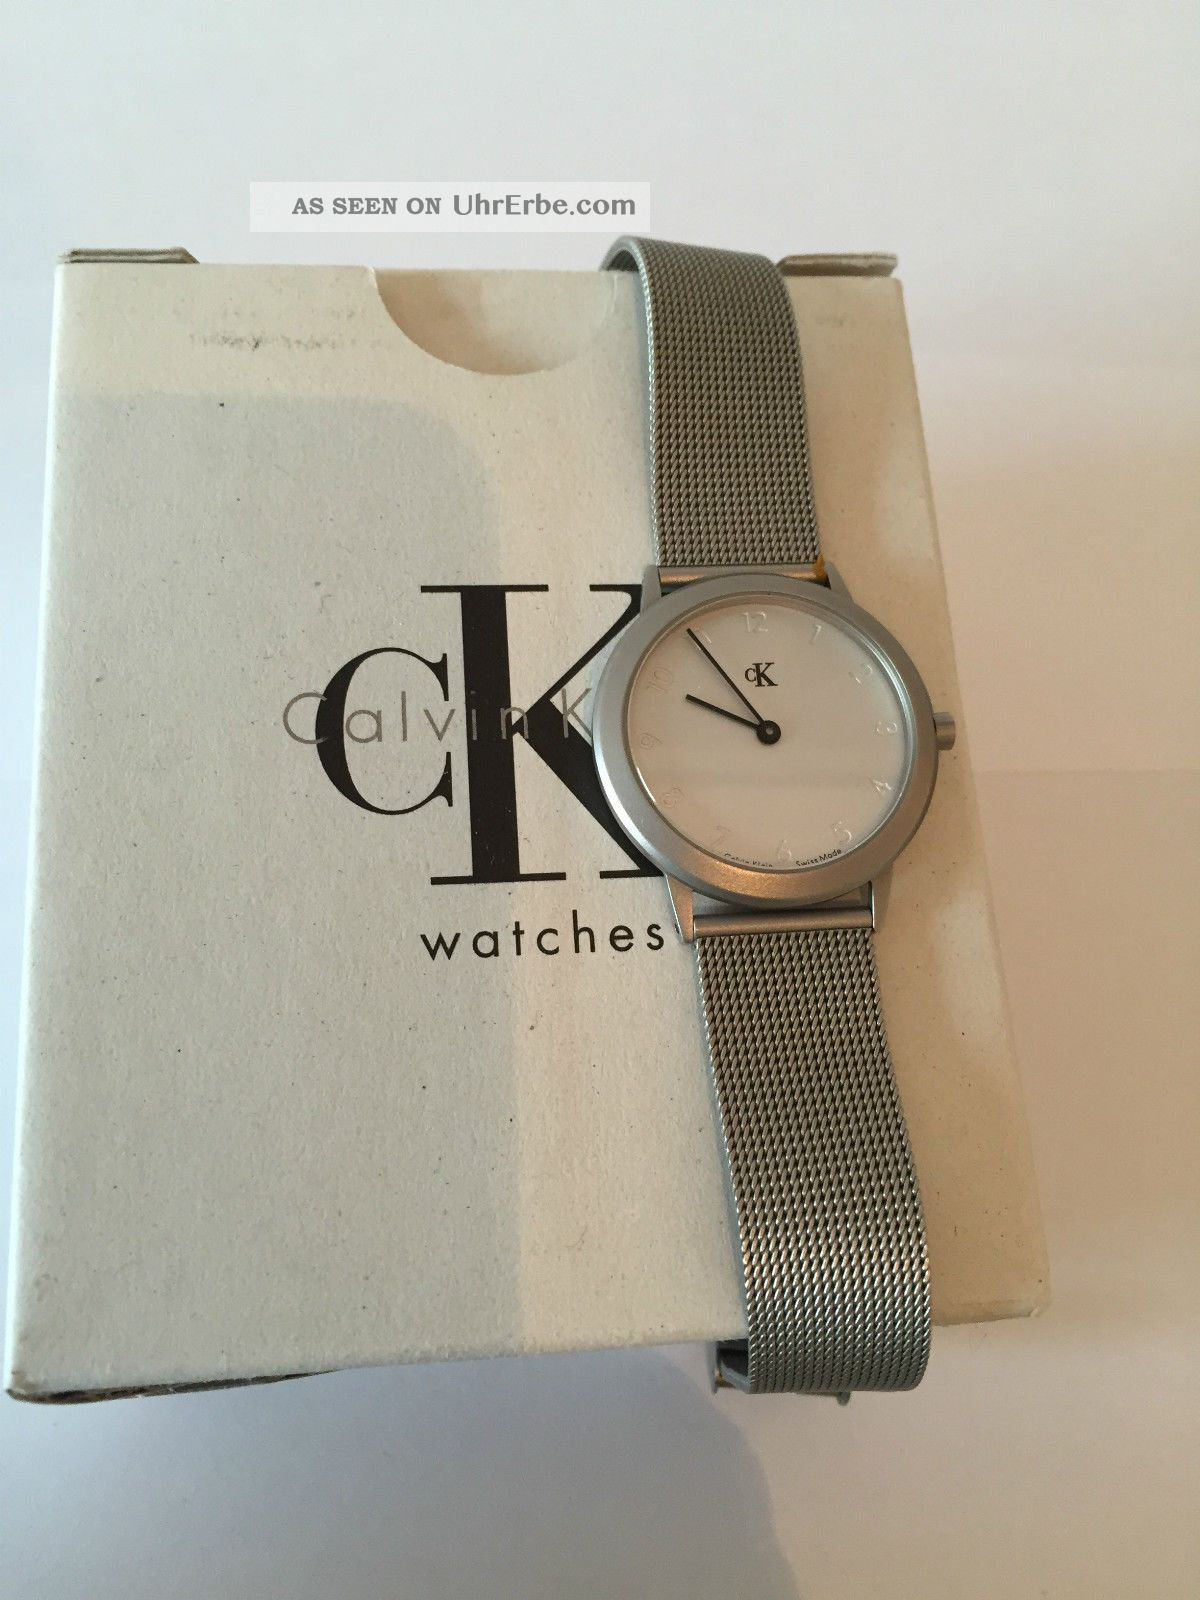 Uhr Armbanduhr Calvin Klein K3121 K3122 Metal Grau Mit Ovp Neue Batterie Armbanduhren Bild